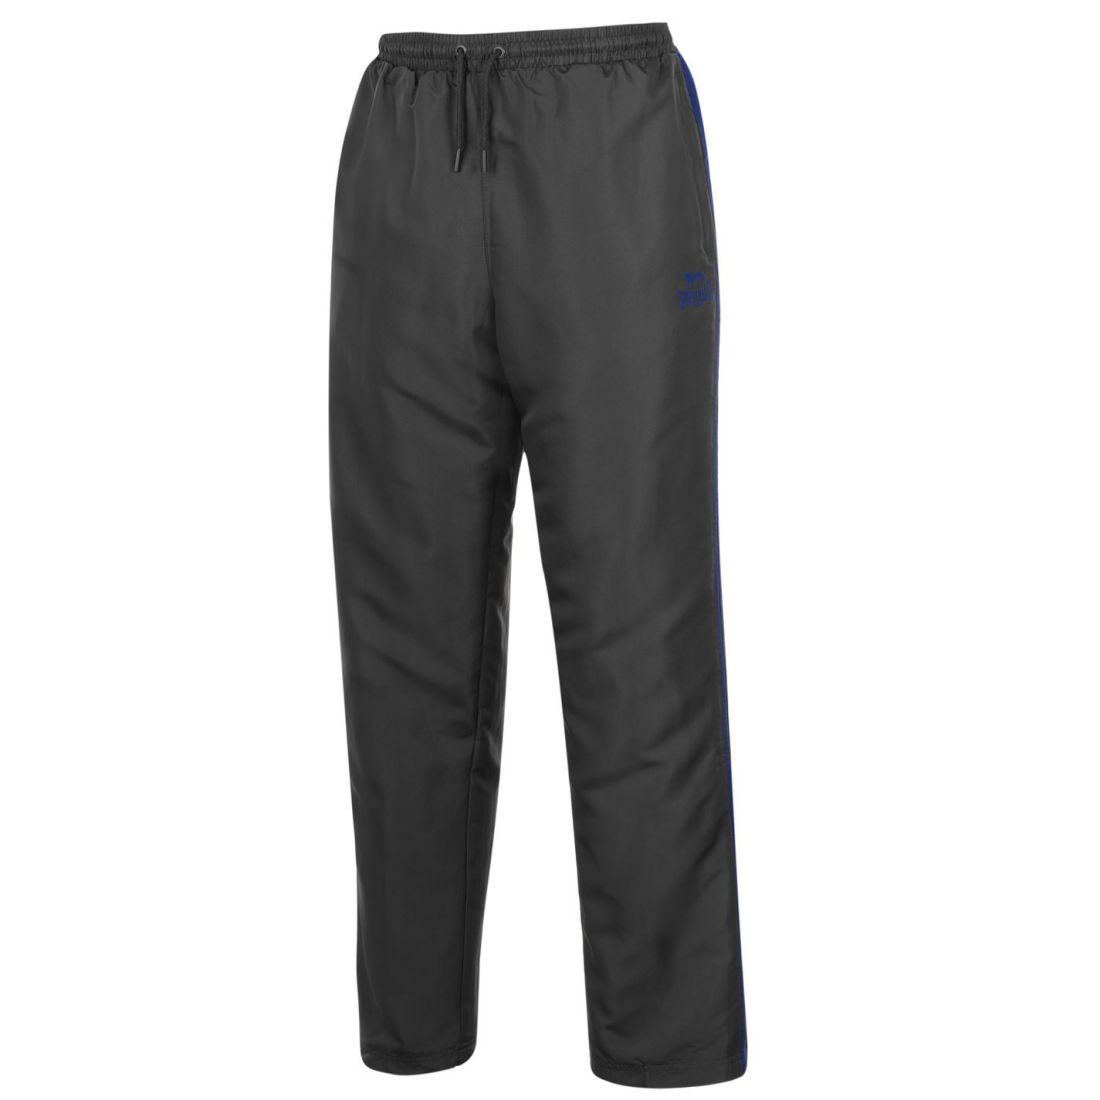 Pants Clothing, Shoes & Accessories Active Lonsdale Mens 2 Stripe Open Hem Woven Pants Tracksuit Bottoms Lightweight Zip